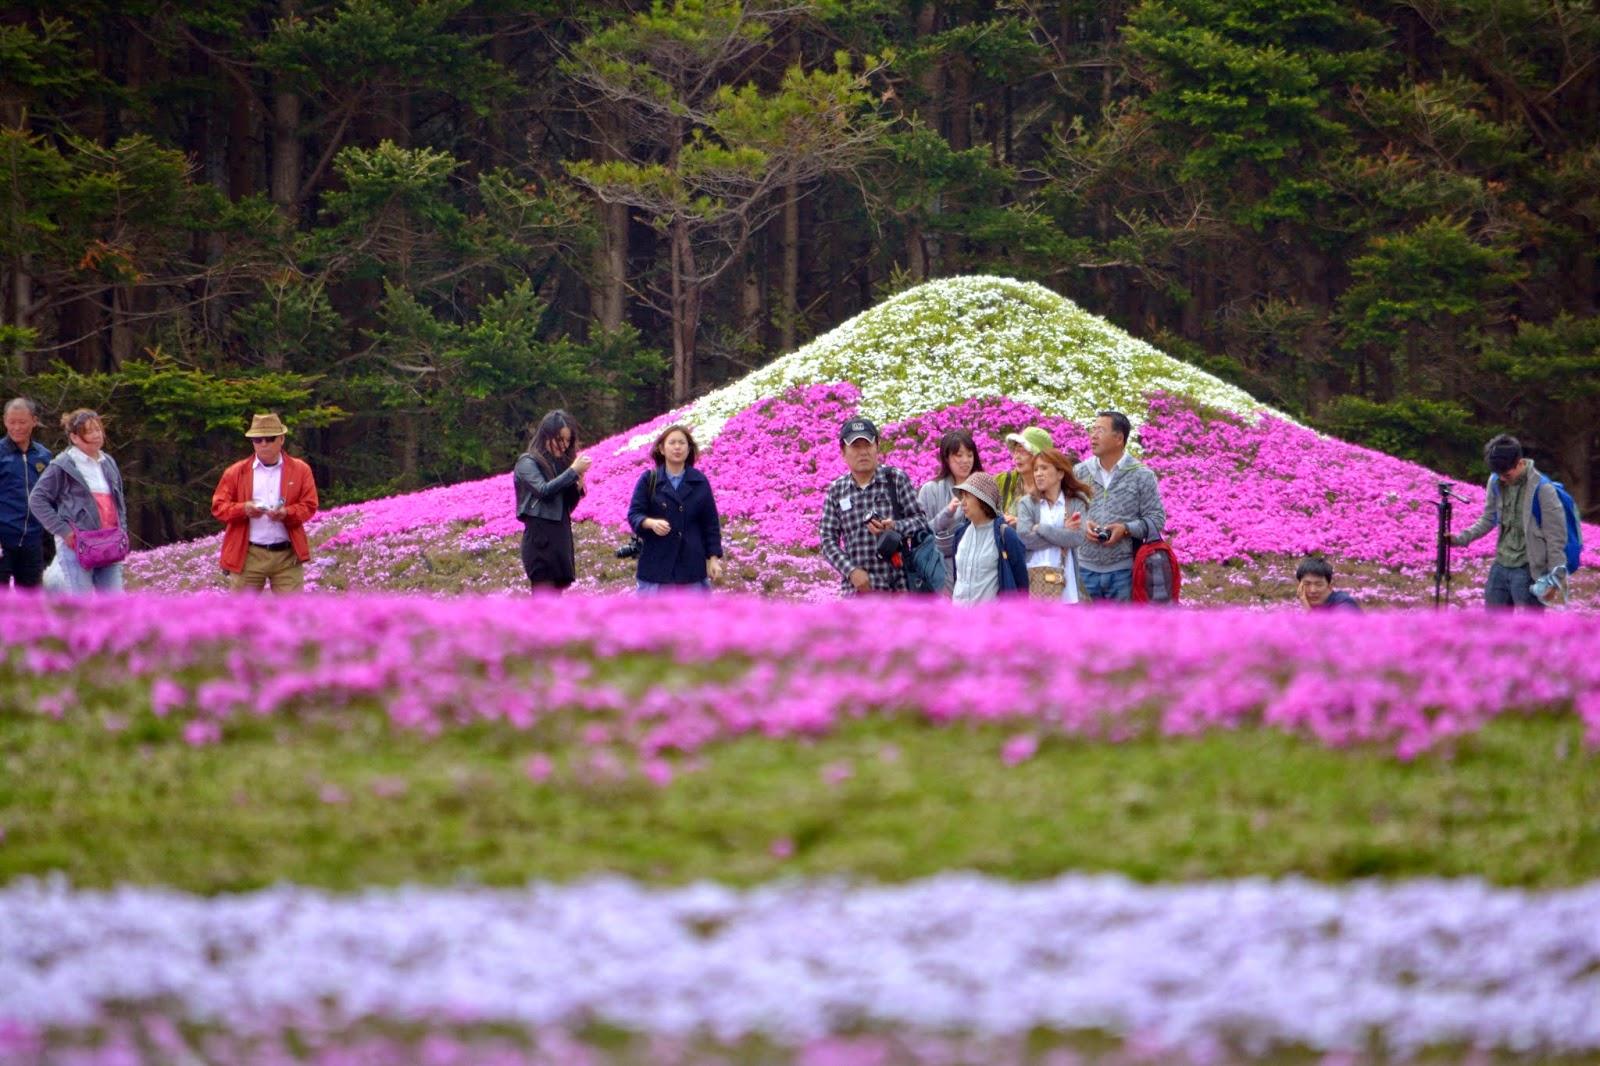 Fuji Shibazakura (pink moss) Festival 2014 in Pictures